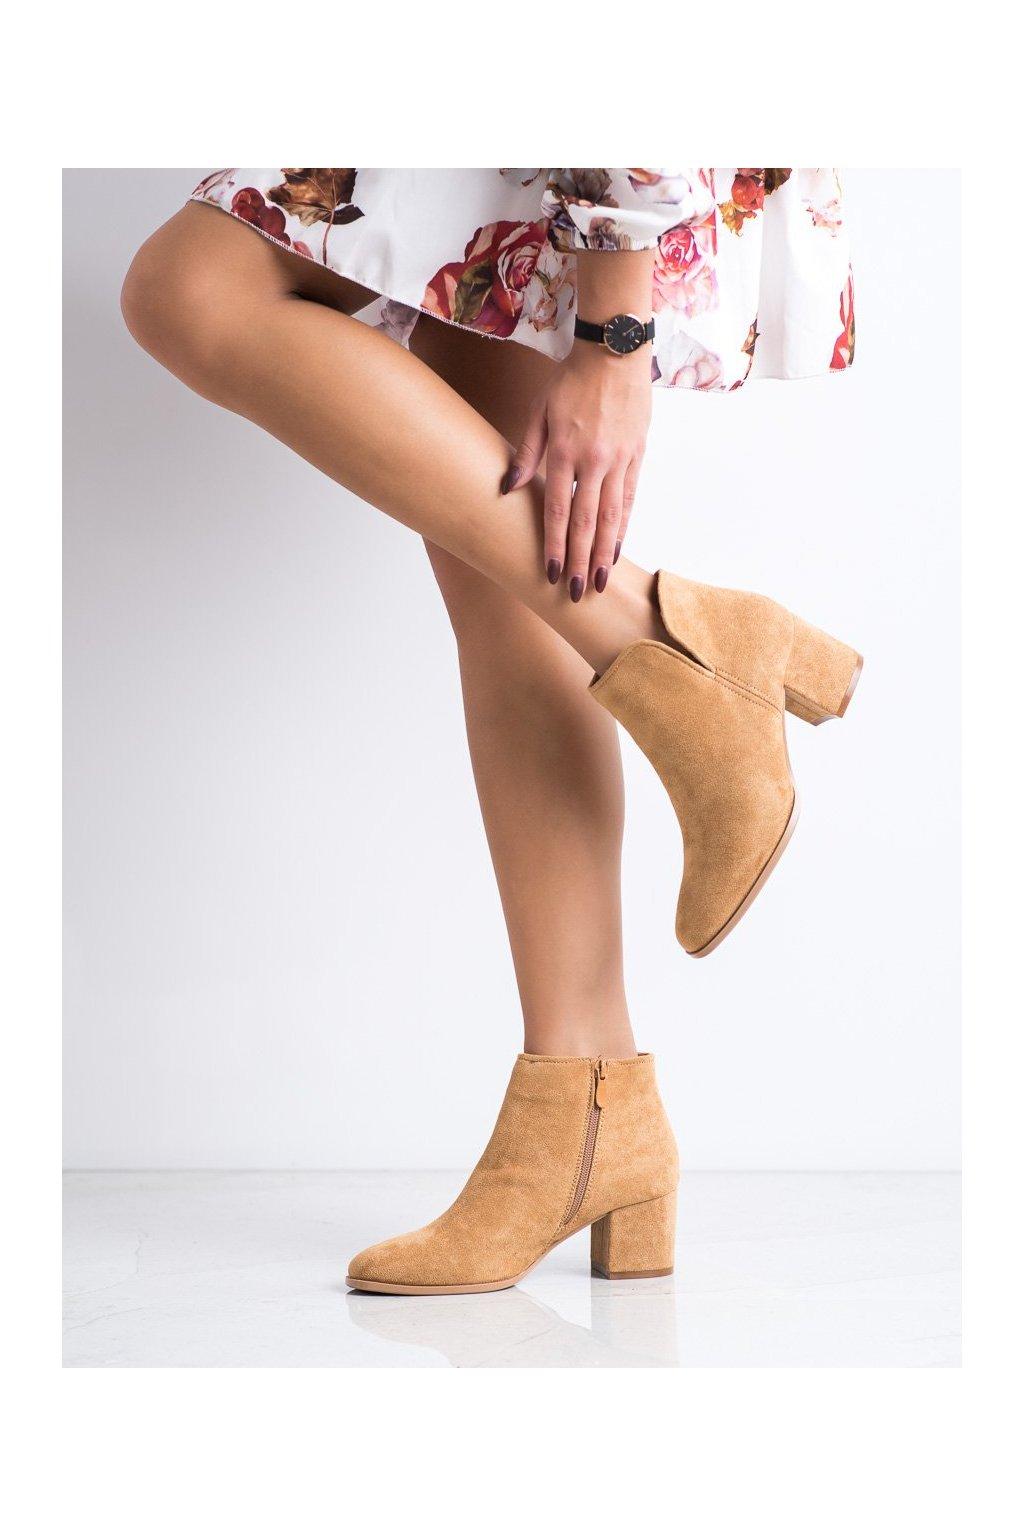 Hnedé dámske topánky Bella paris kod A6205C